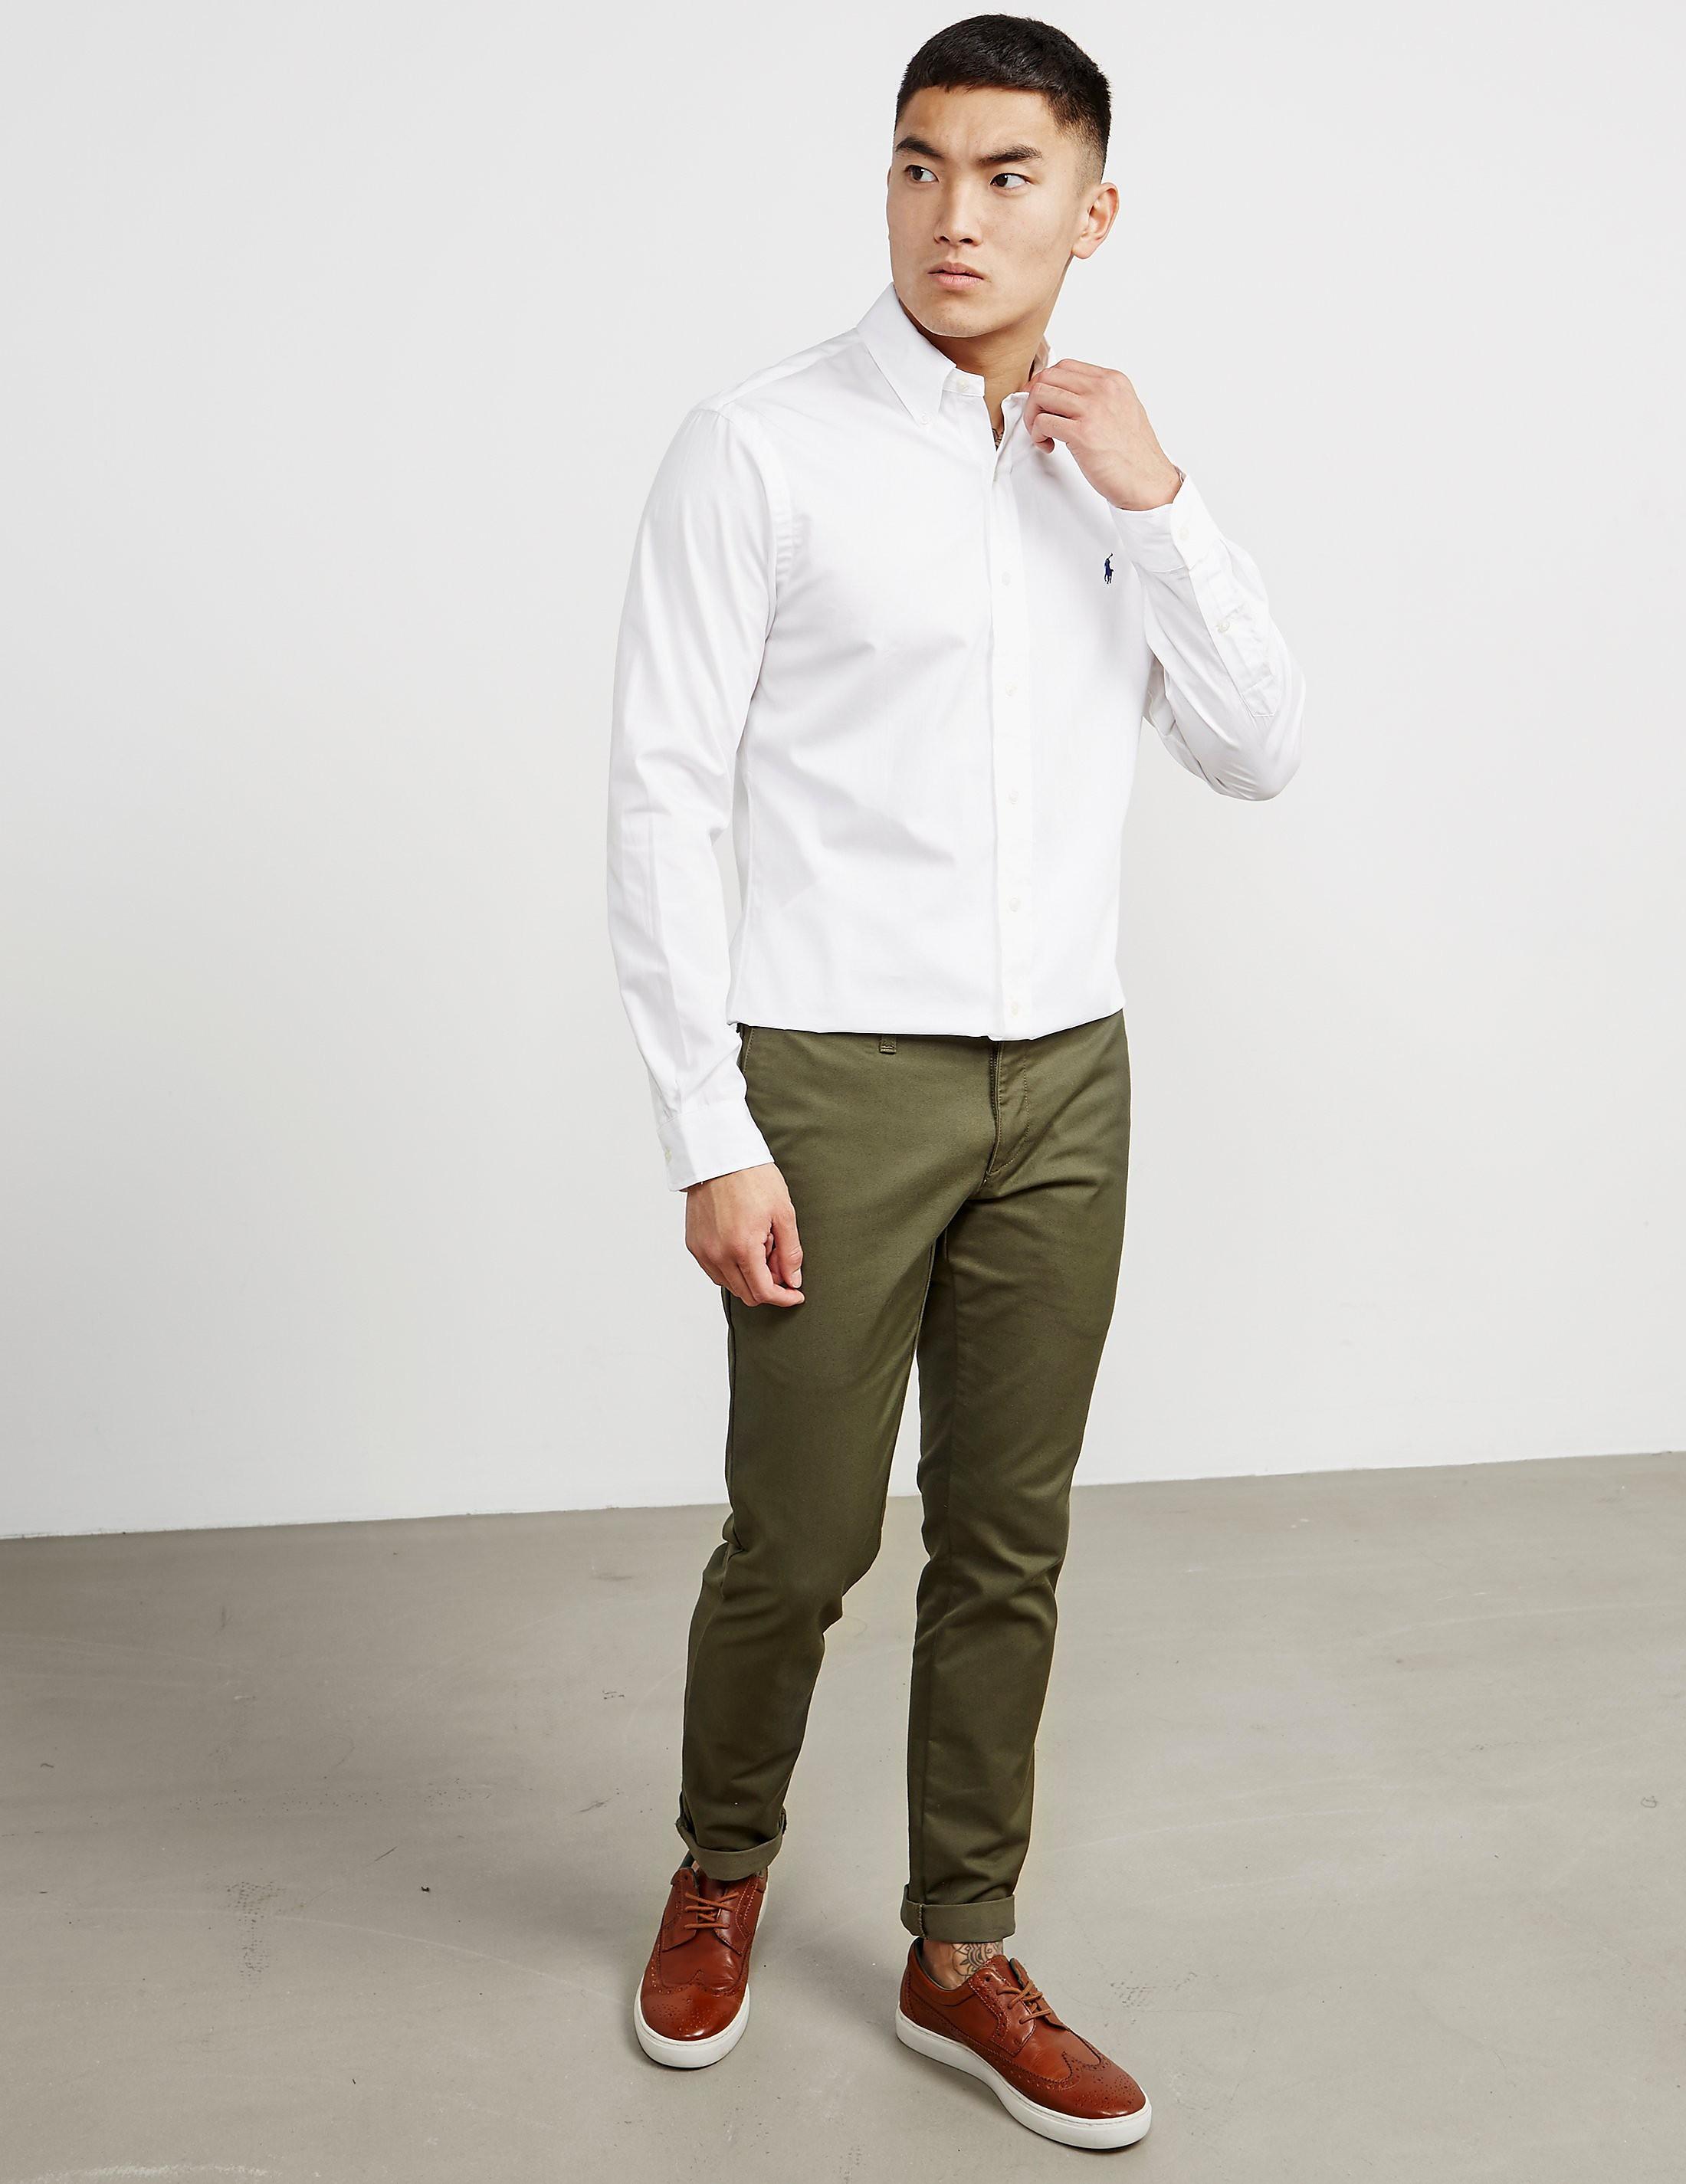 Polo Ralph Lauren LS Slim Fit Shirt